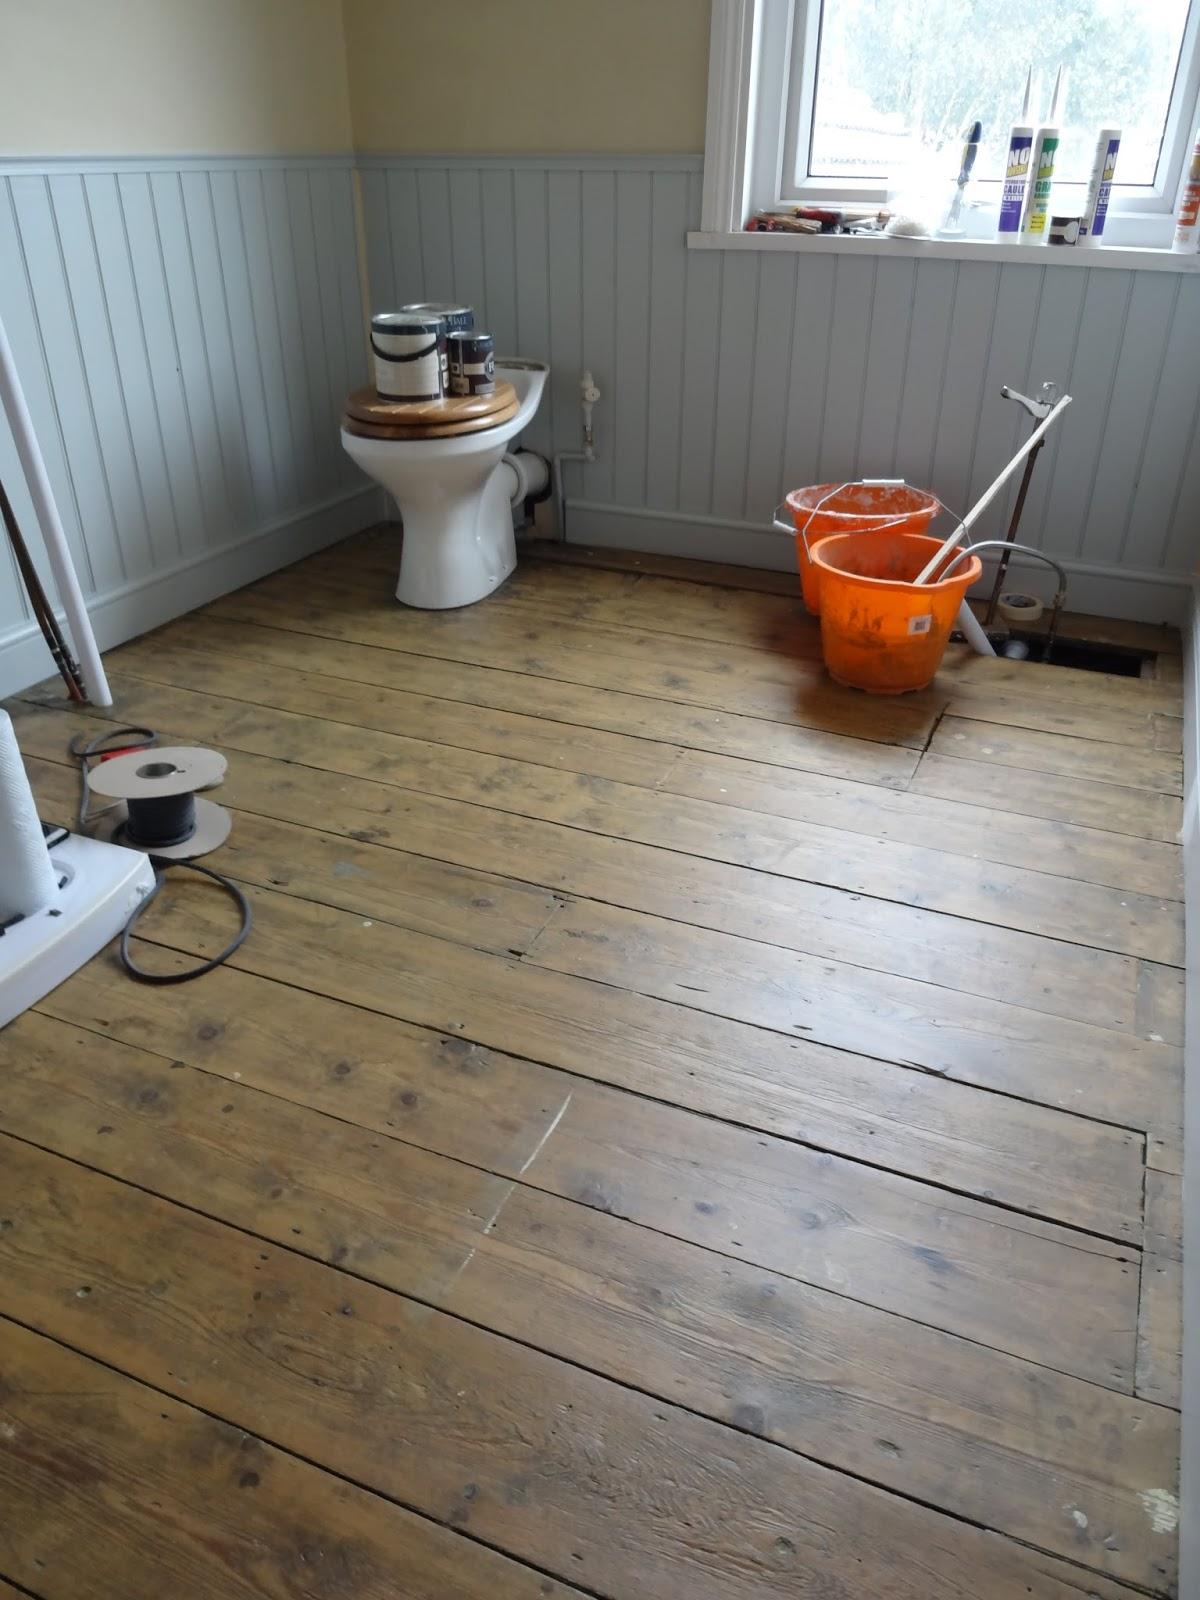 Bathroom floorboards